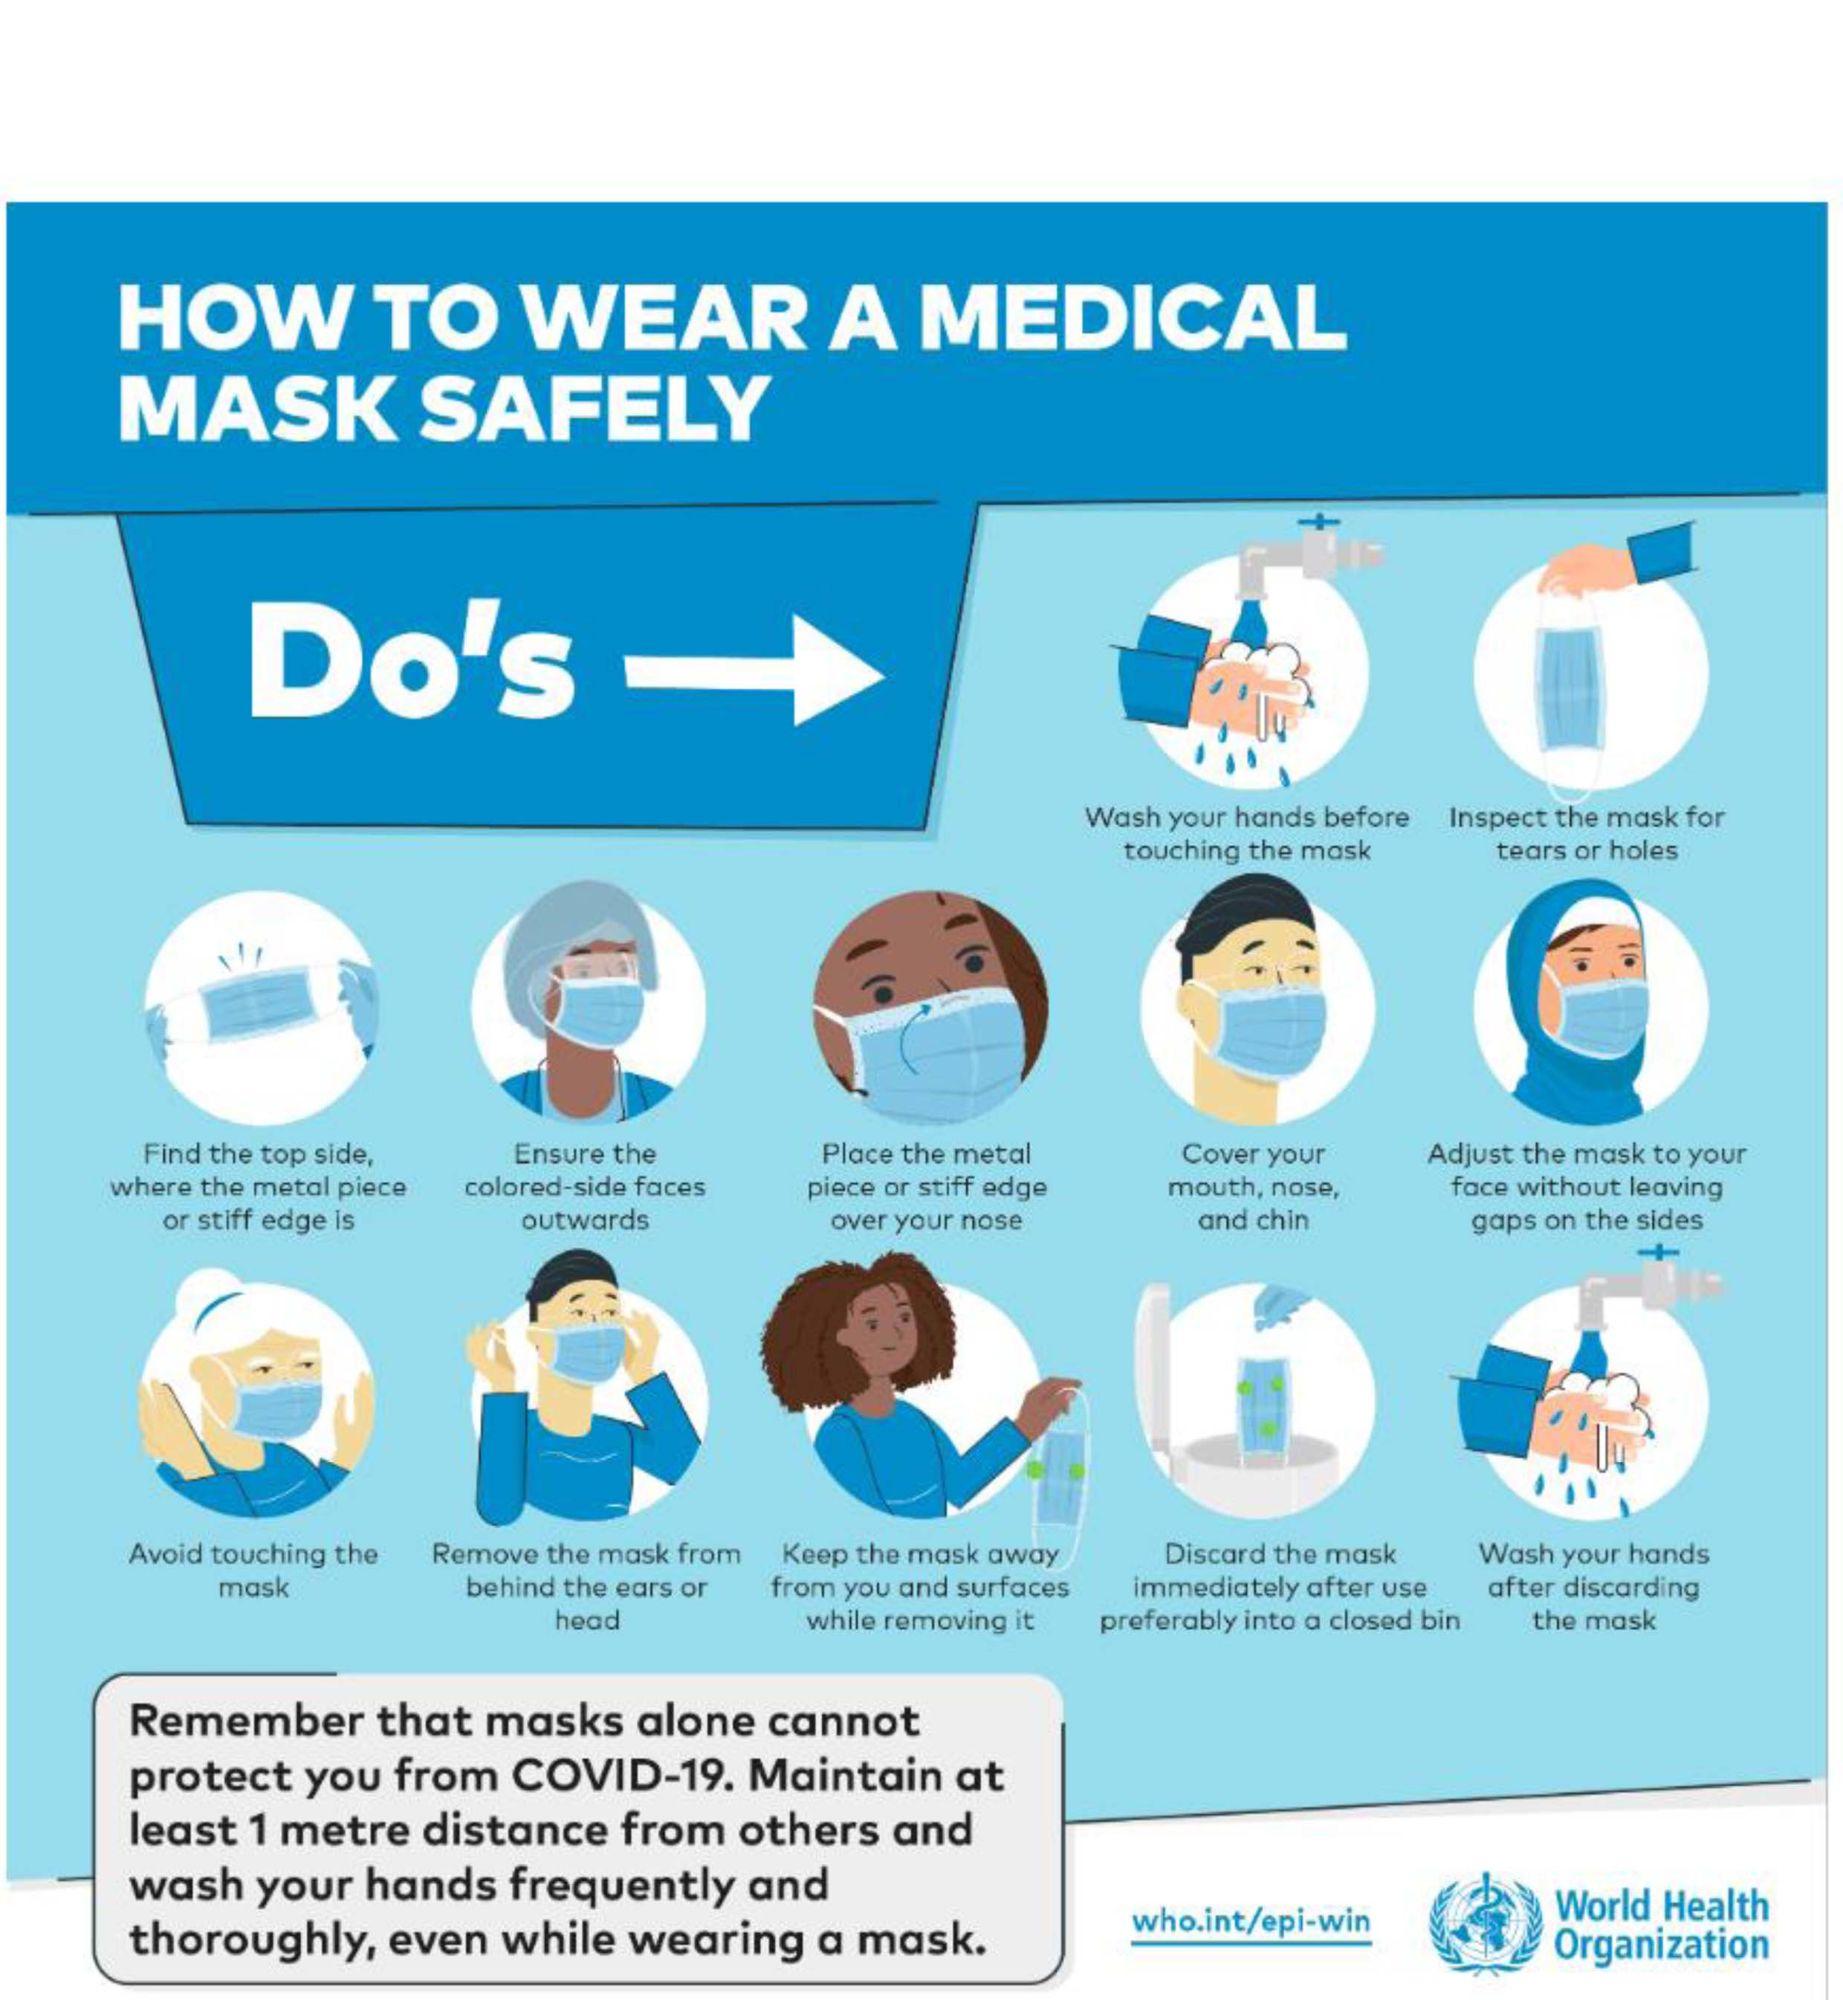 Medical Face Mask Guidance